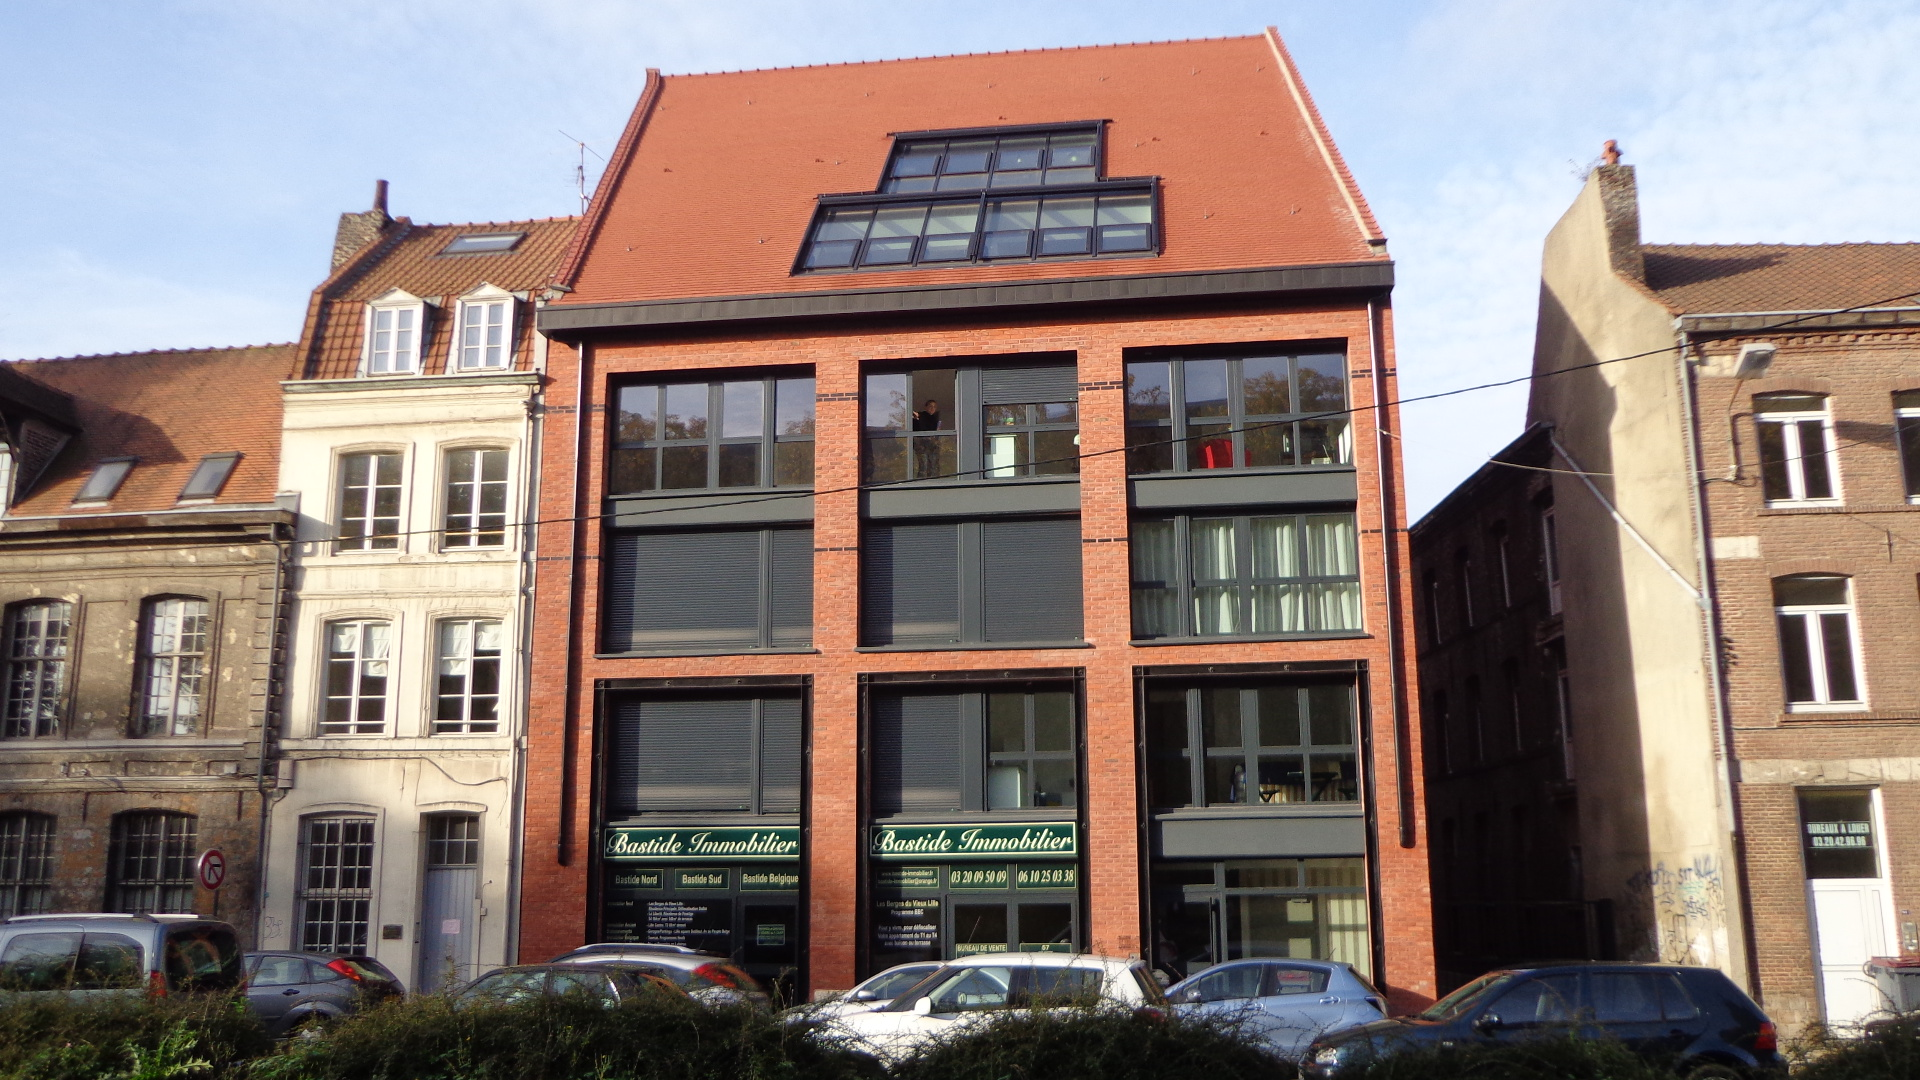 Bastide immobilier programme les berges du vieux lille for Garage lille sud